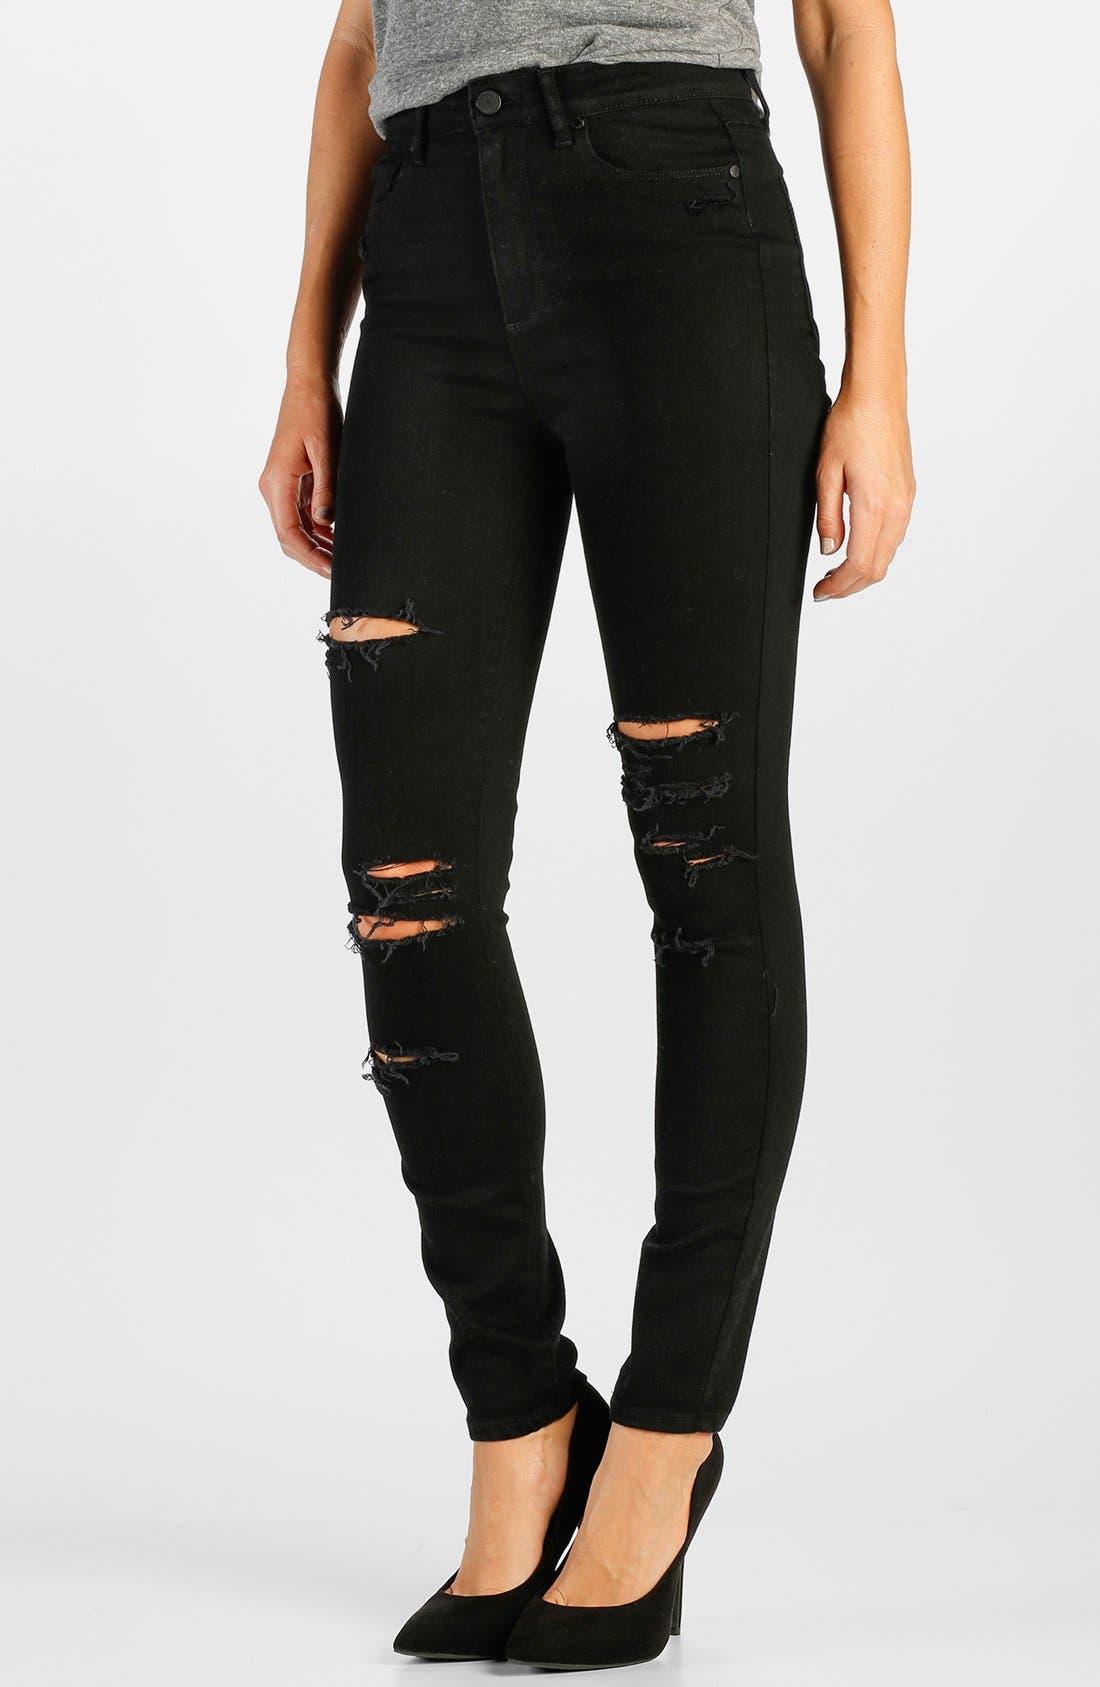 Alternate Image 1 Selected - Paige Denim 'Margot' High Rise Skinny Jeans (Black Arlo Destructed)